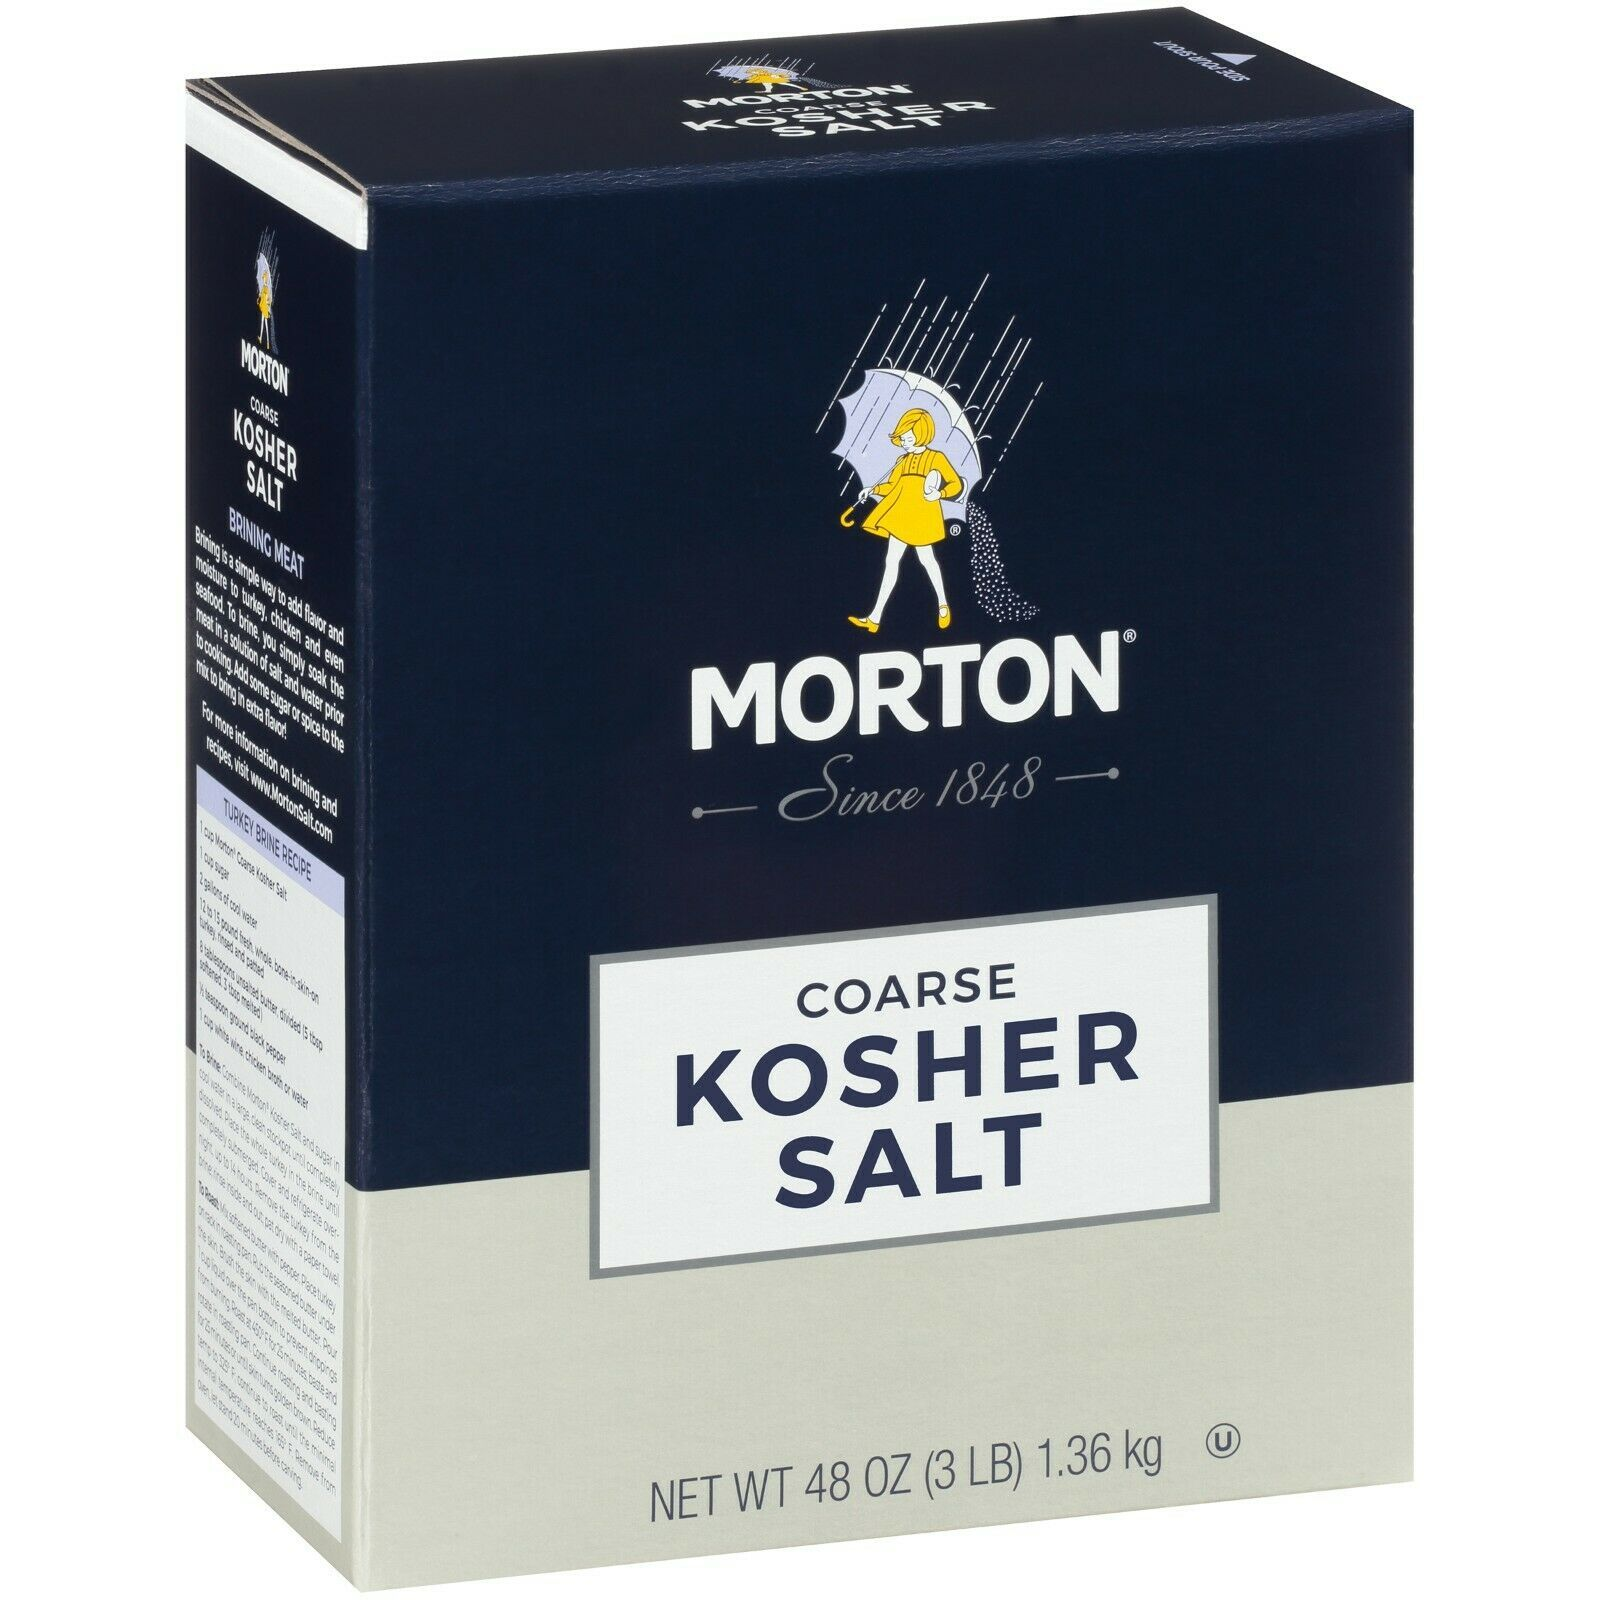 Morton  Coarse Kosher Salt 3 lbs - $6.25